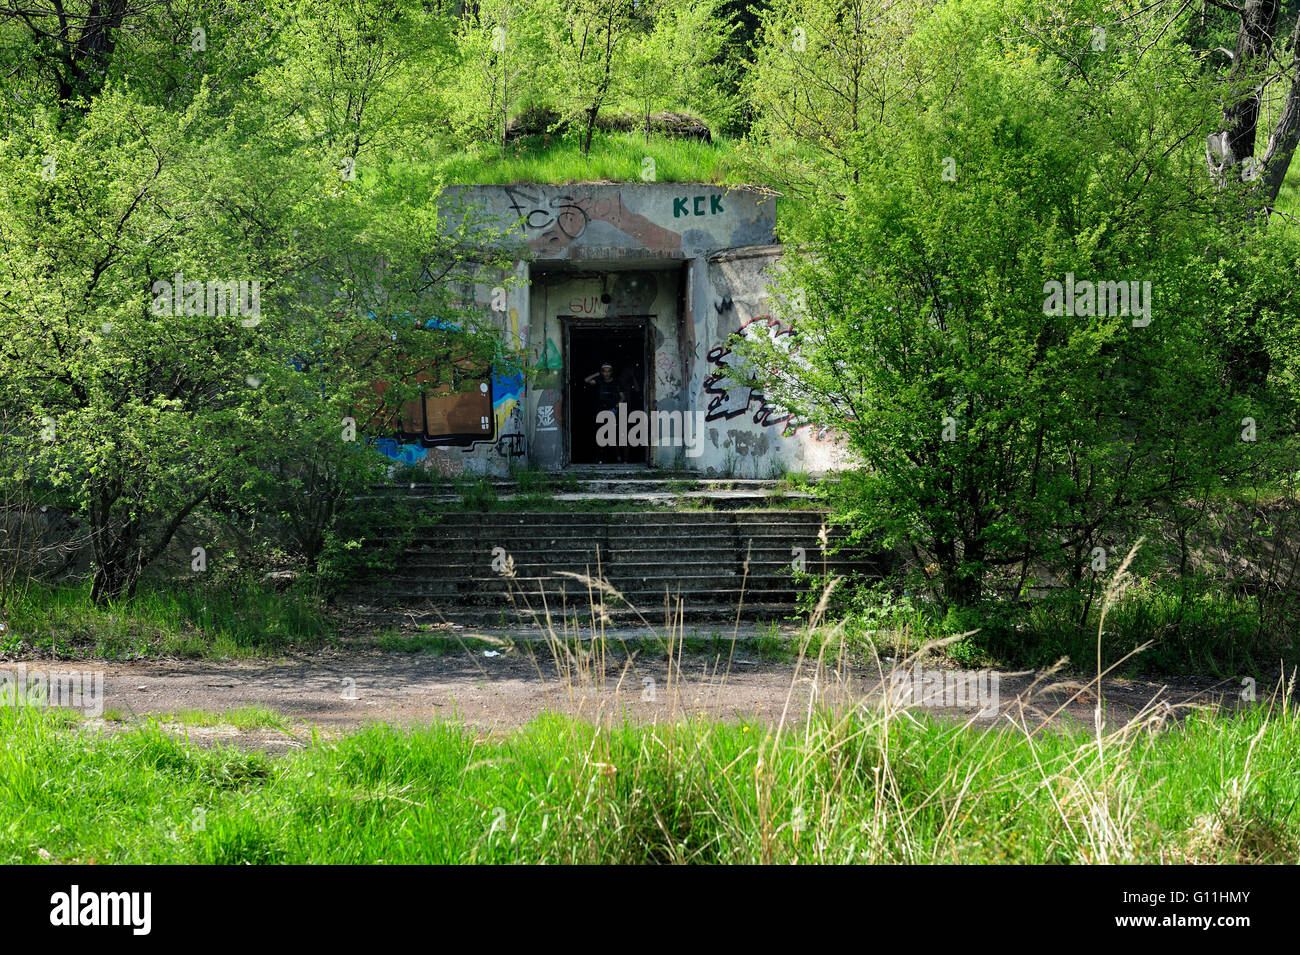 Sábado 7 de mayo de 2016, Witoszow, Baja Silesia, Polonia, comando bunker del Grupo Norte del Ejército Imagen De Stock